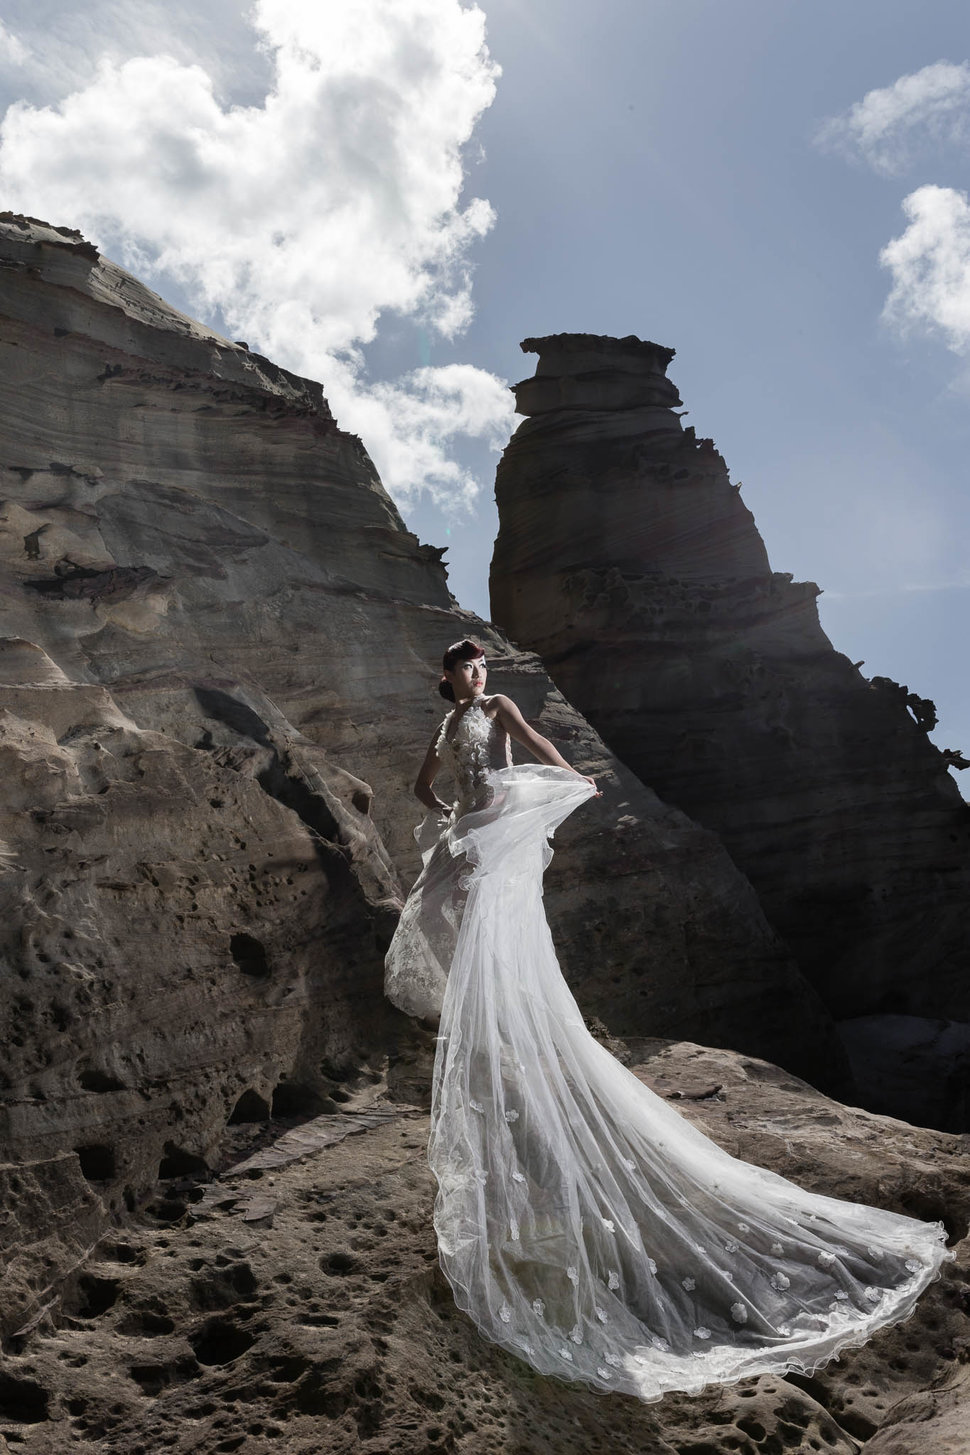 18PHOTO自主婚紗-自信與優雅的征服(編號:214901) - 18PHOTO 婚紗影像攝影工作室 - 結婚吧